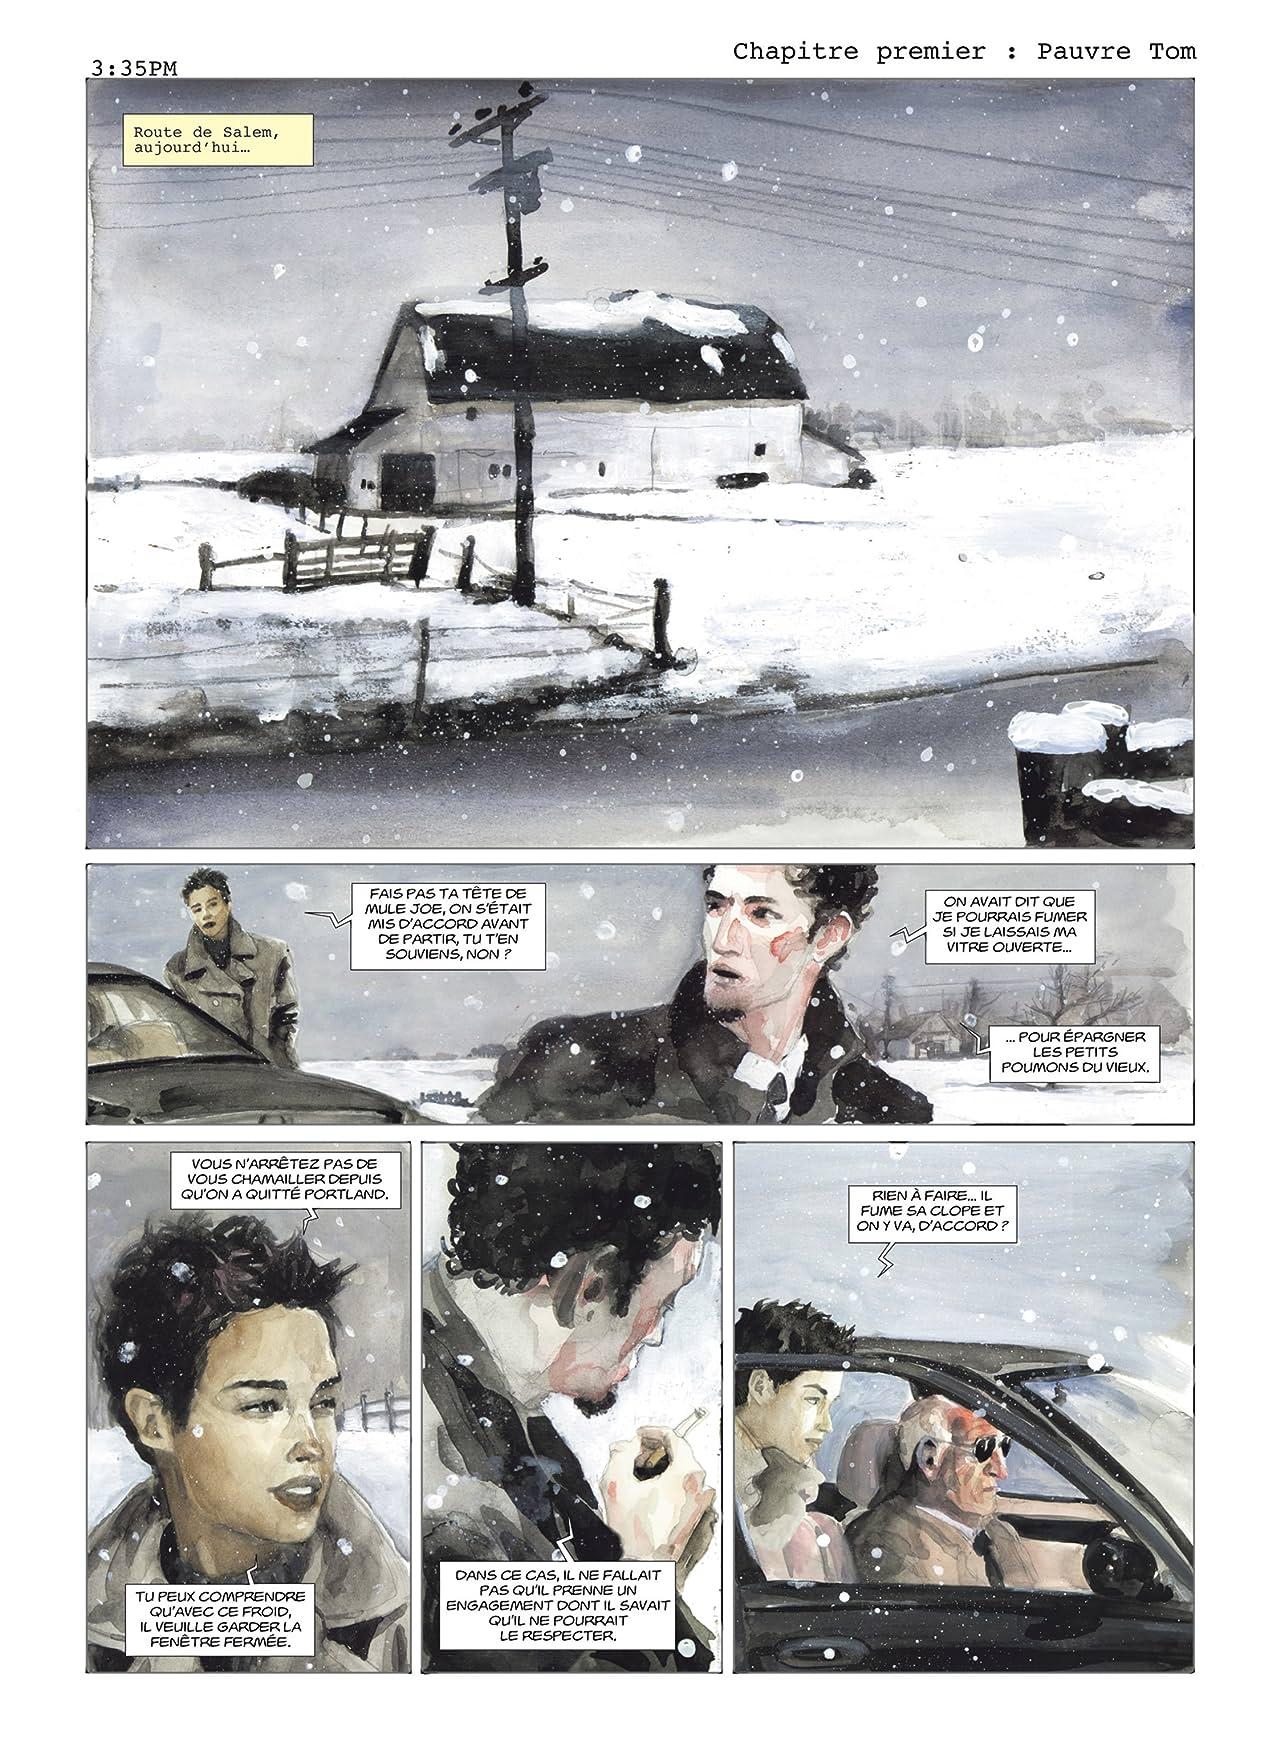 Dusk Vol. 1: Pauvre Tom